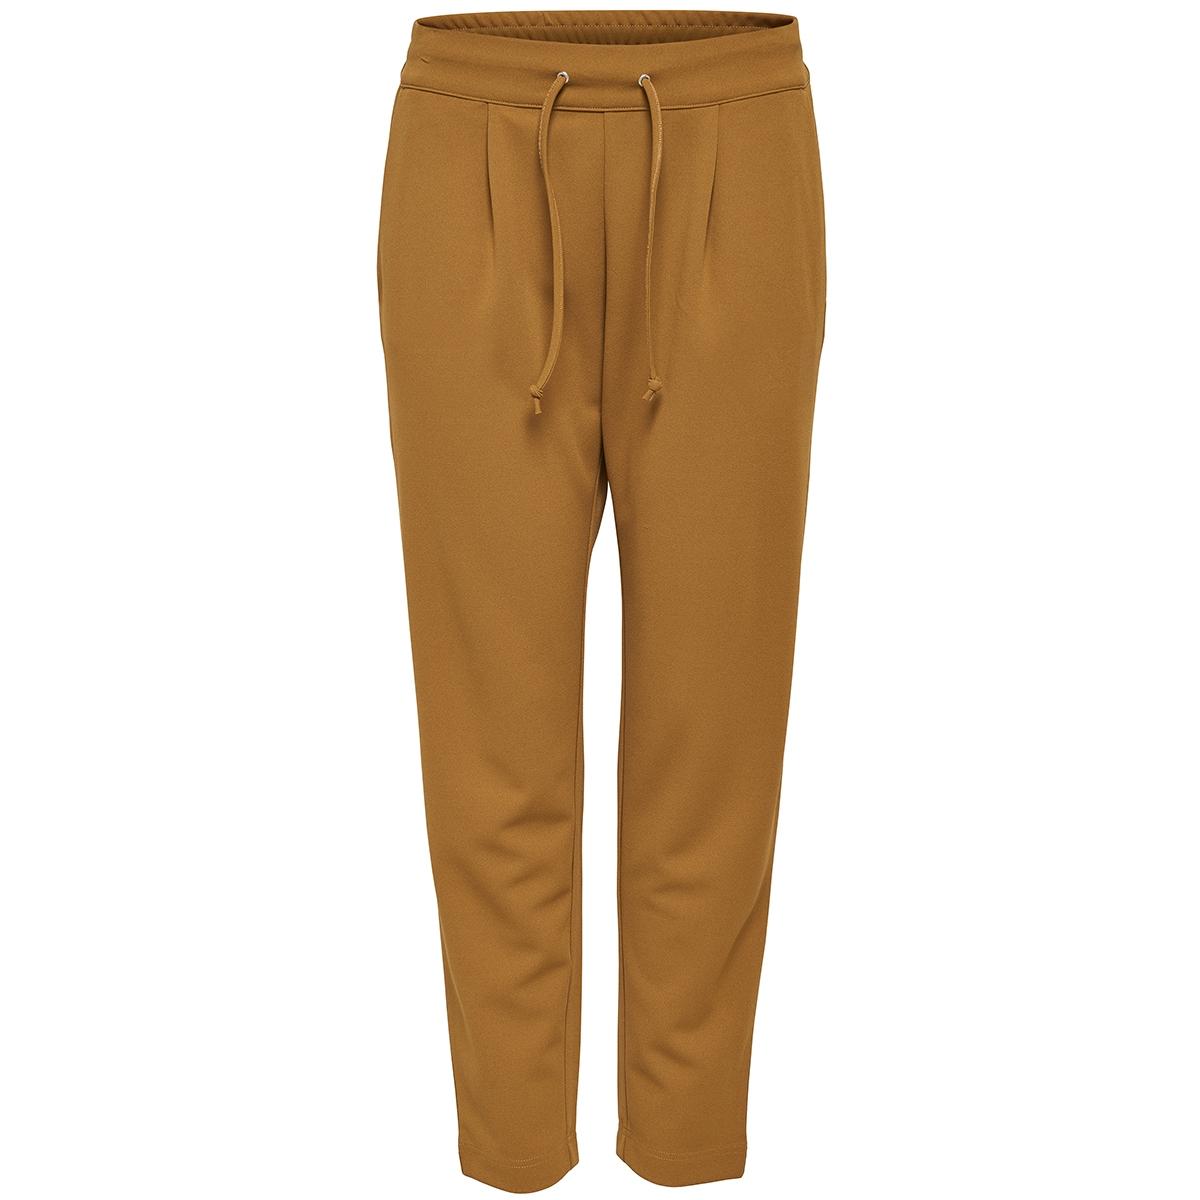 jdysaint pant jrs 15140901 jacqueline de yong broek golden brown